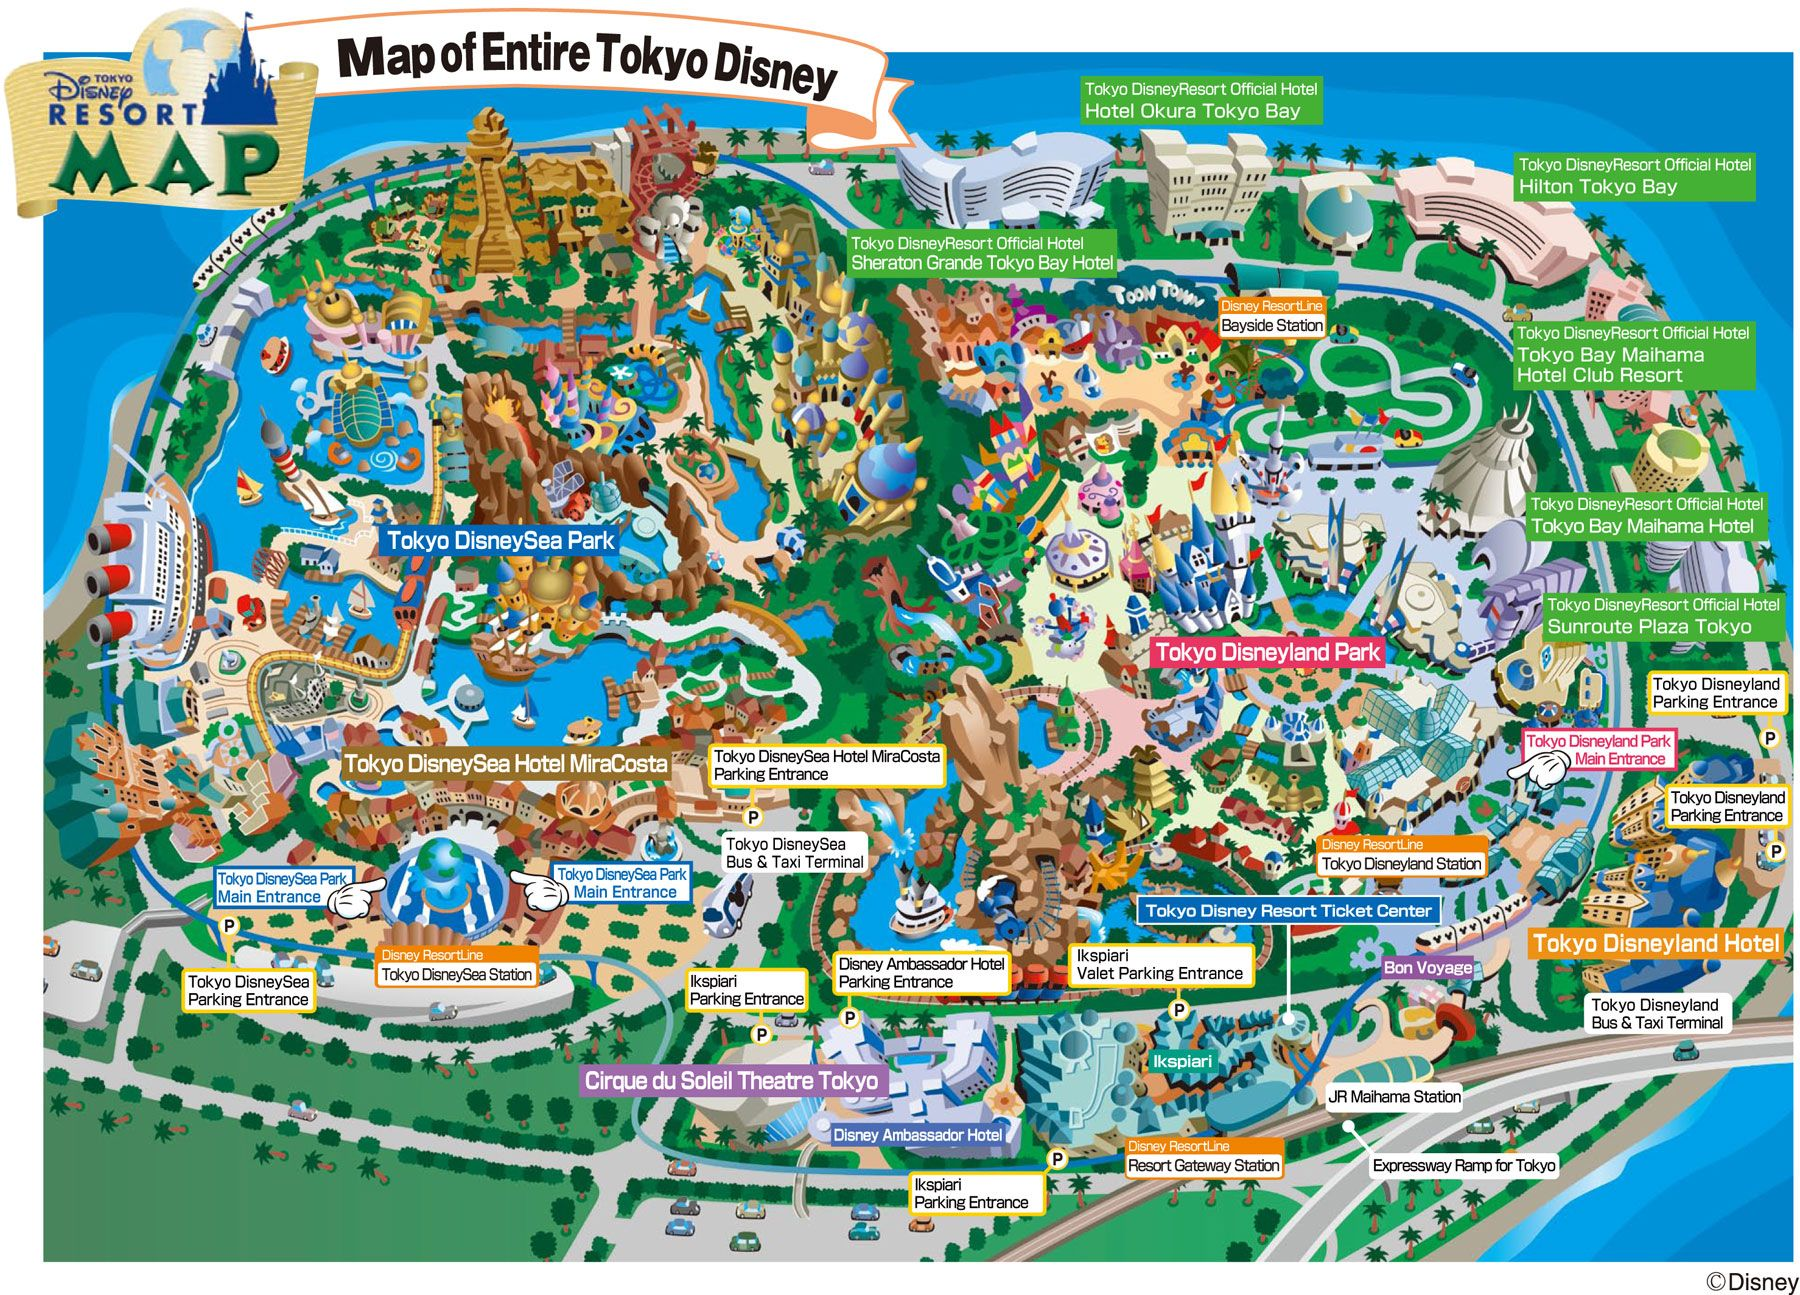 Tokyo Disneyland Map Map Pinterest Disneyland Map Tokyo - Disneyland brazil map